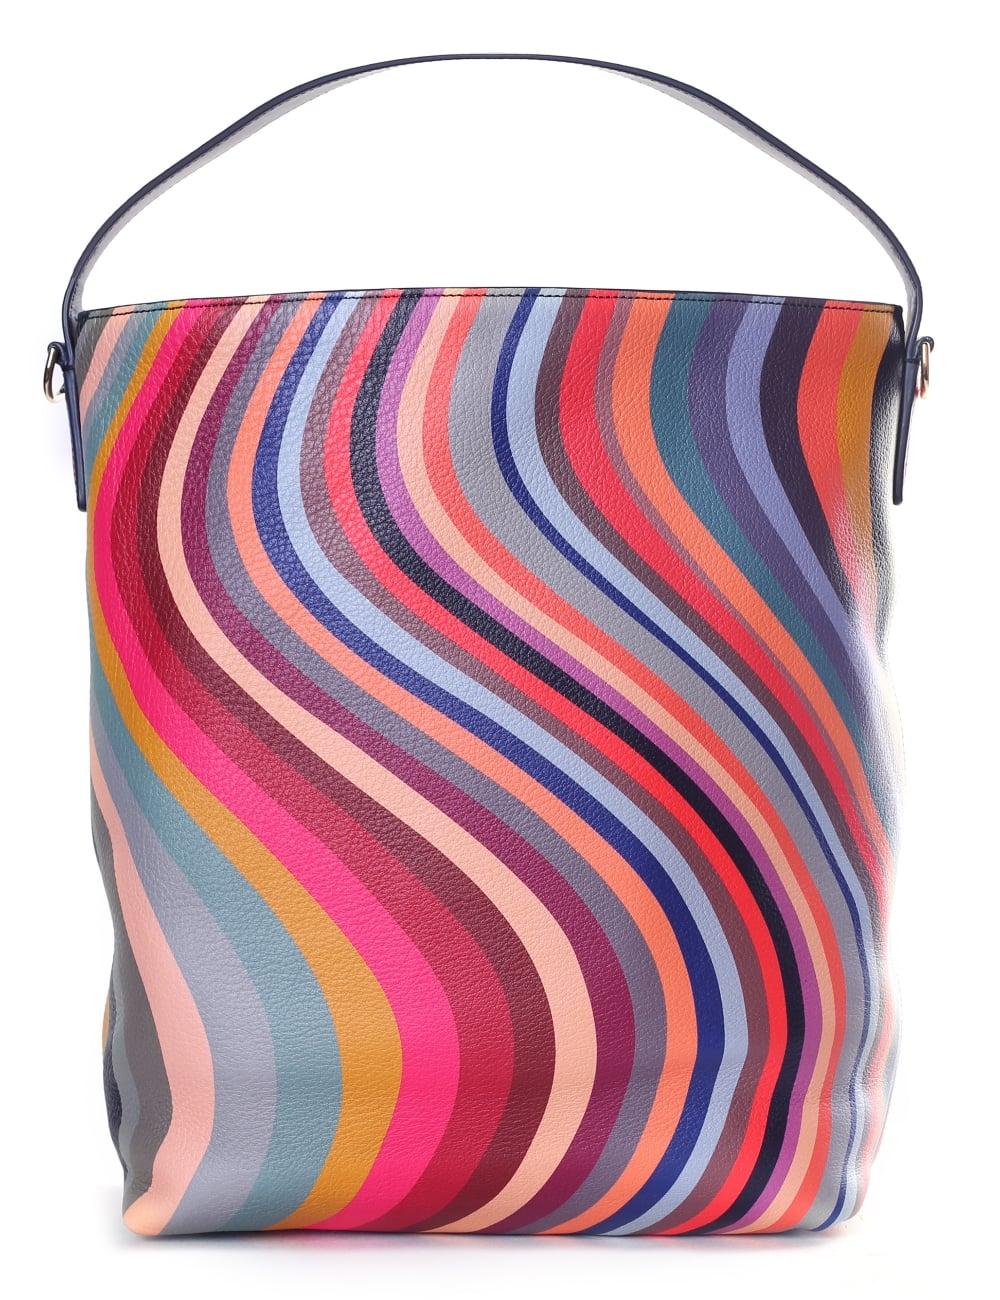 paul smith swirl zip hobo bag on sale 22f75 dc43f - yalamhrgnat.com b9f9fceab9b9b